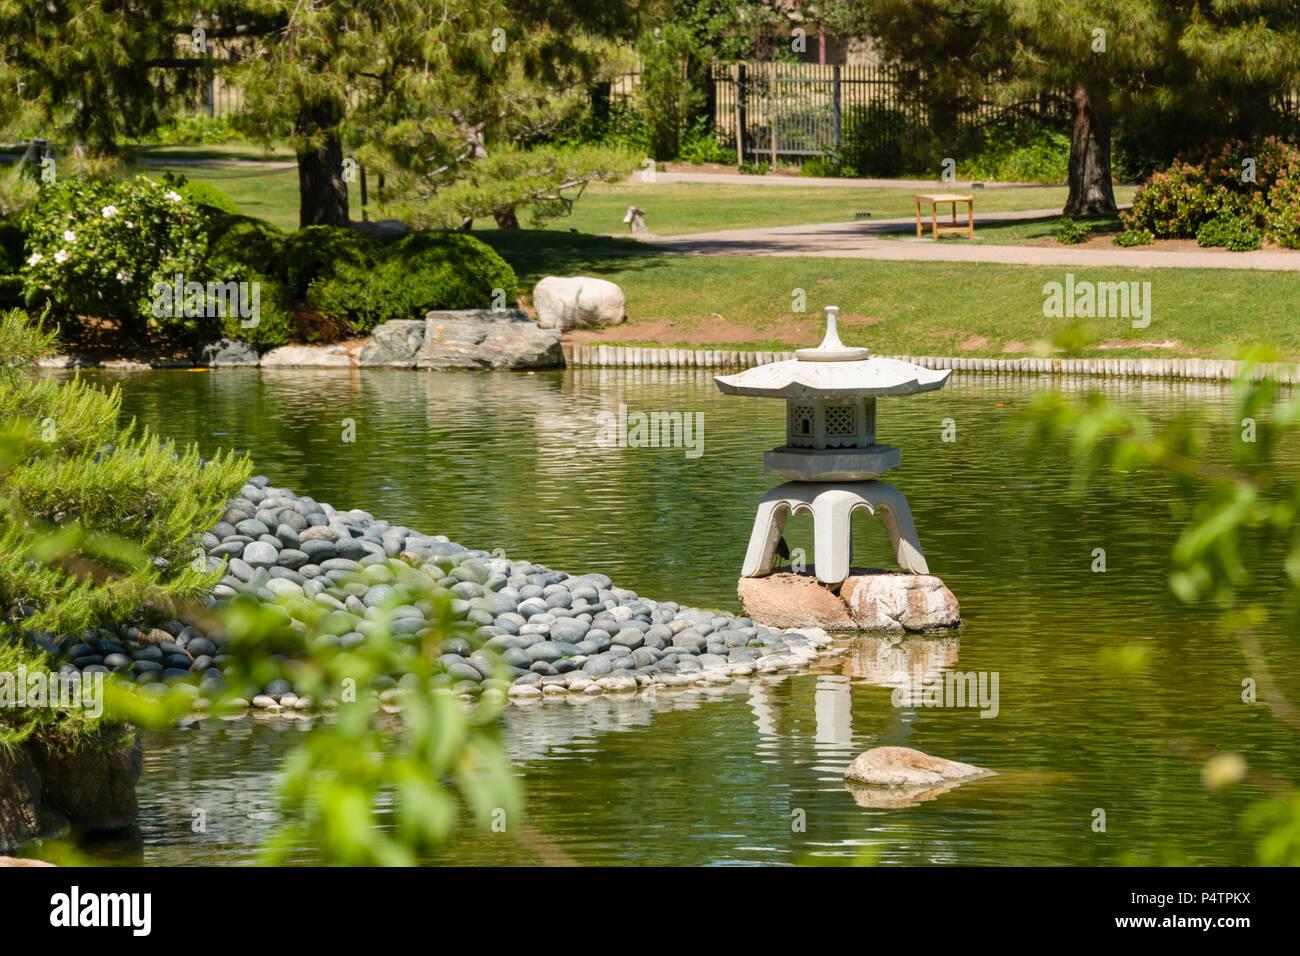 Japanese Friendship Garden Koi Pond And Stone Lantern Stock Photo Alamy